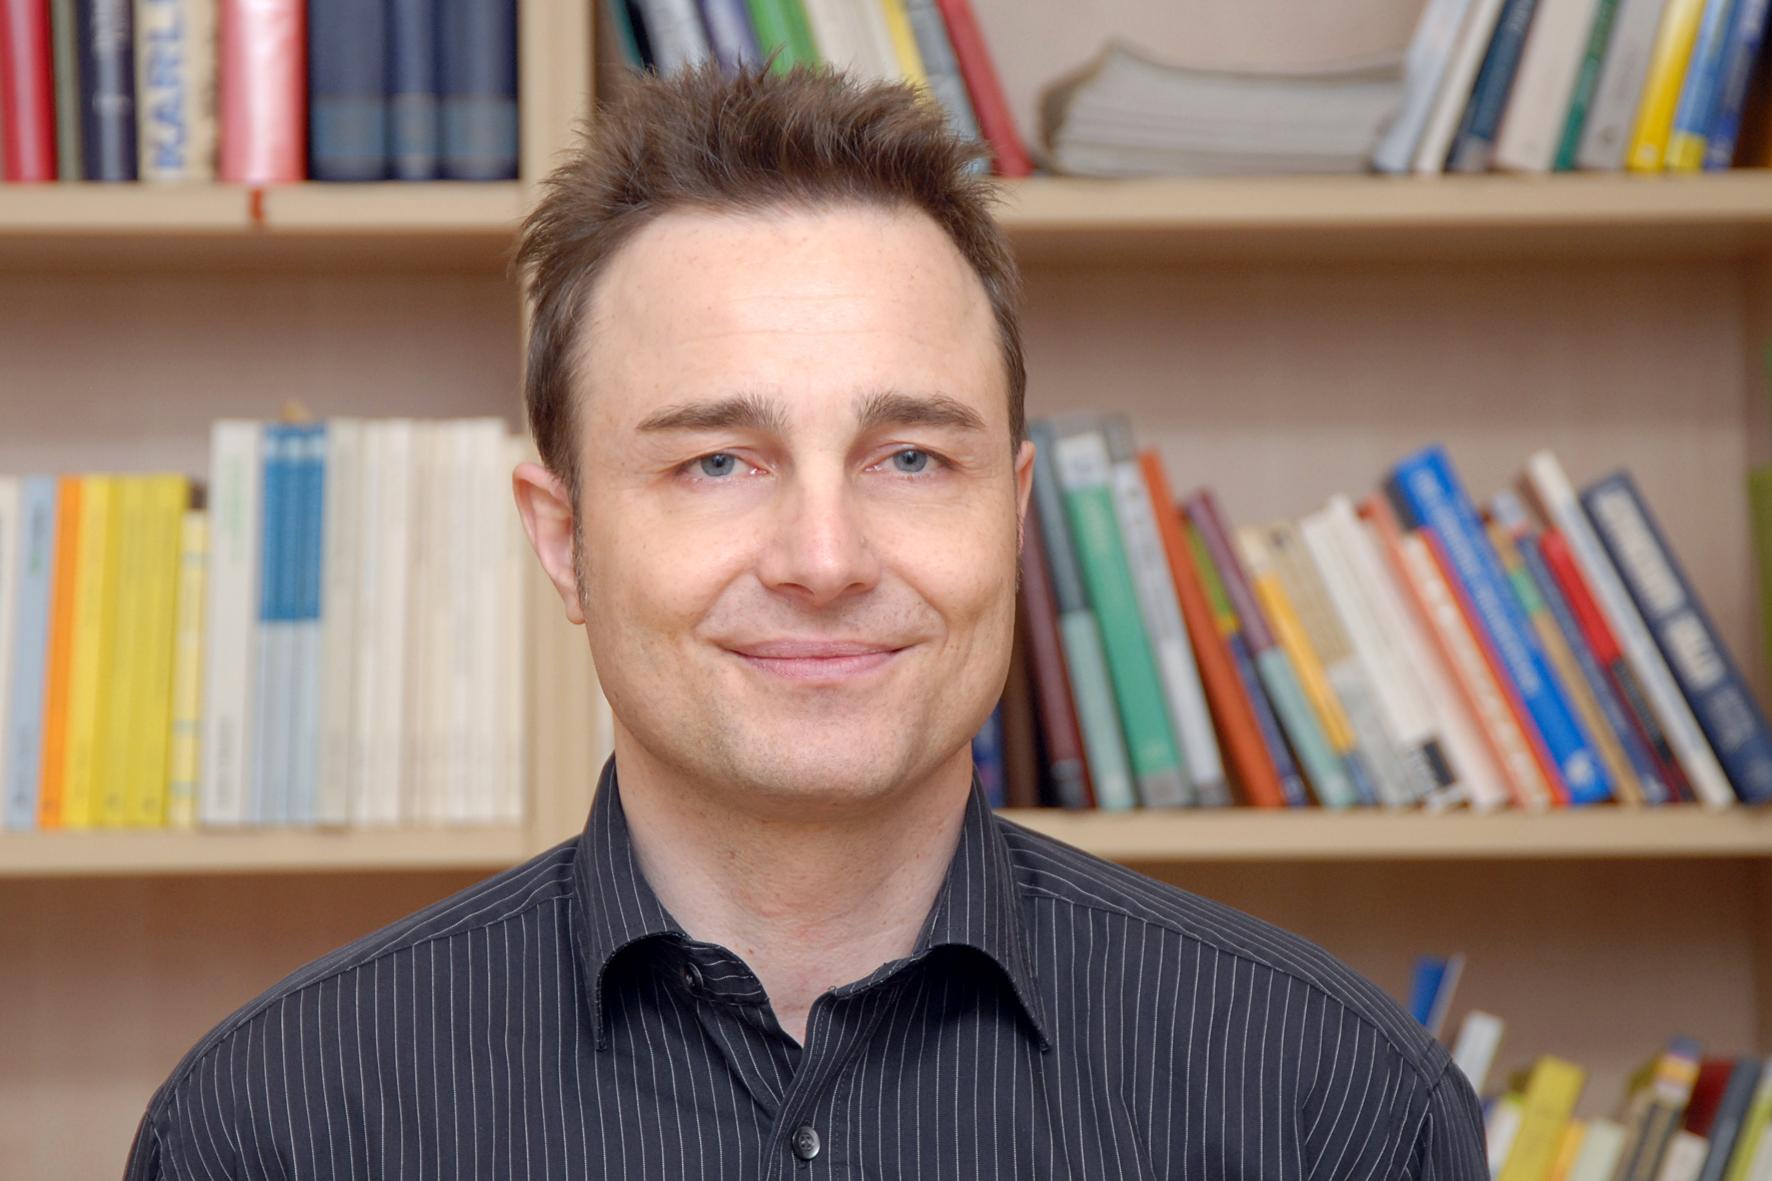 Prof. Dr. Nils C. Bandelow